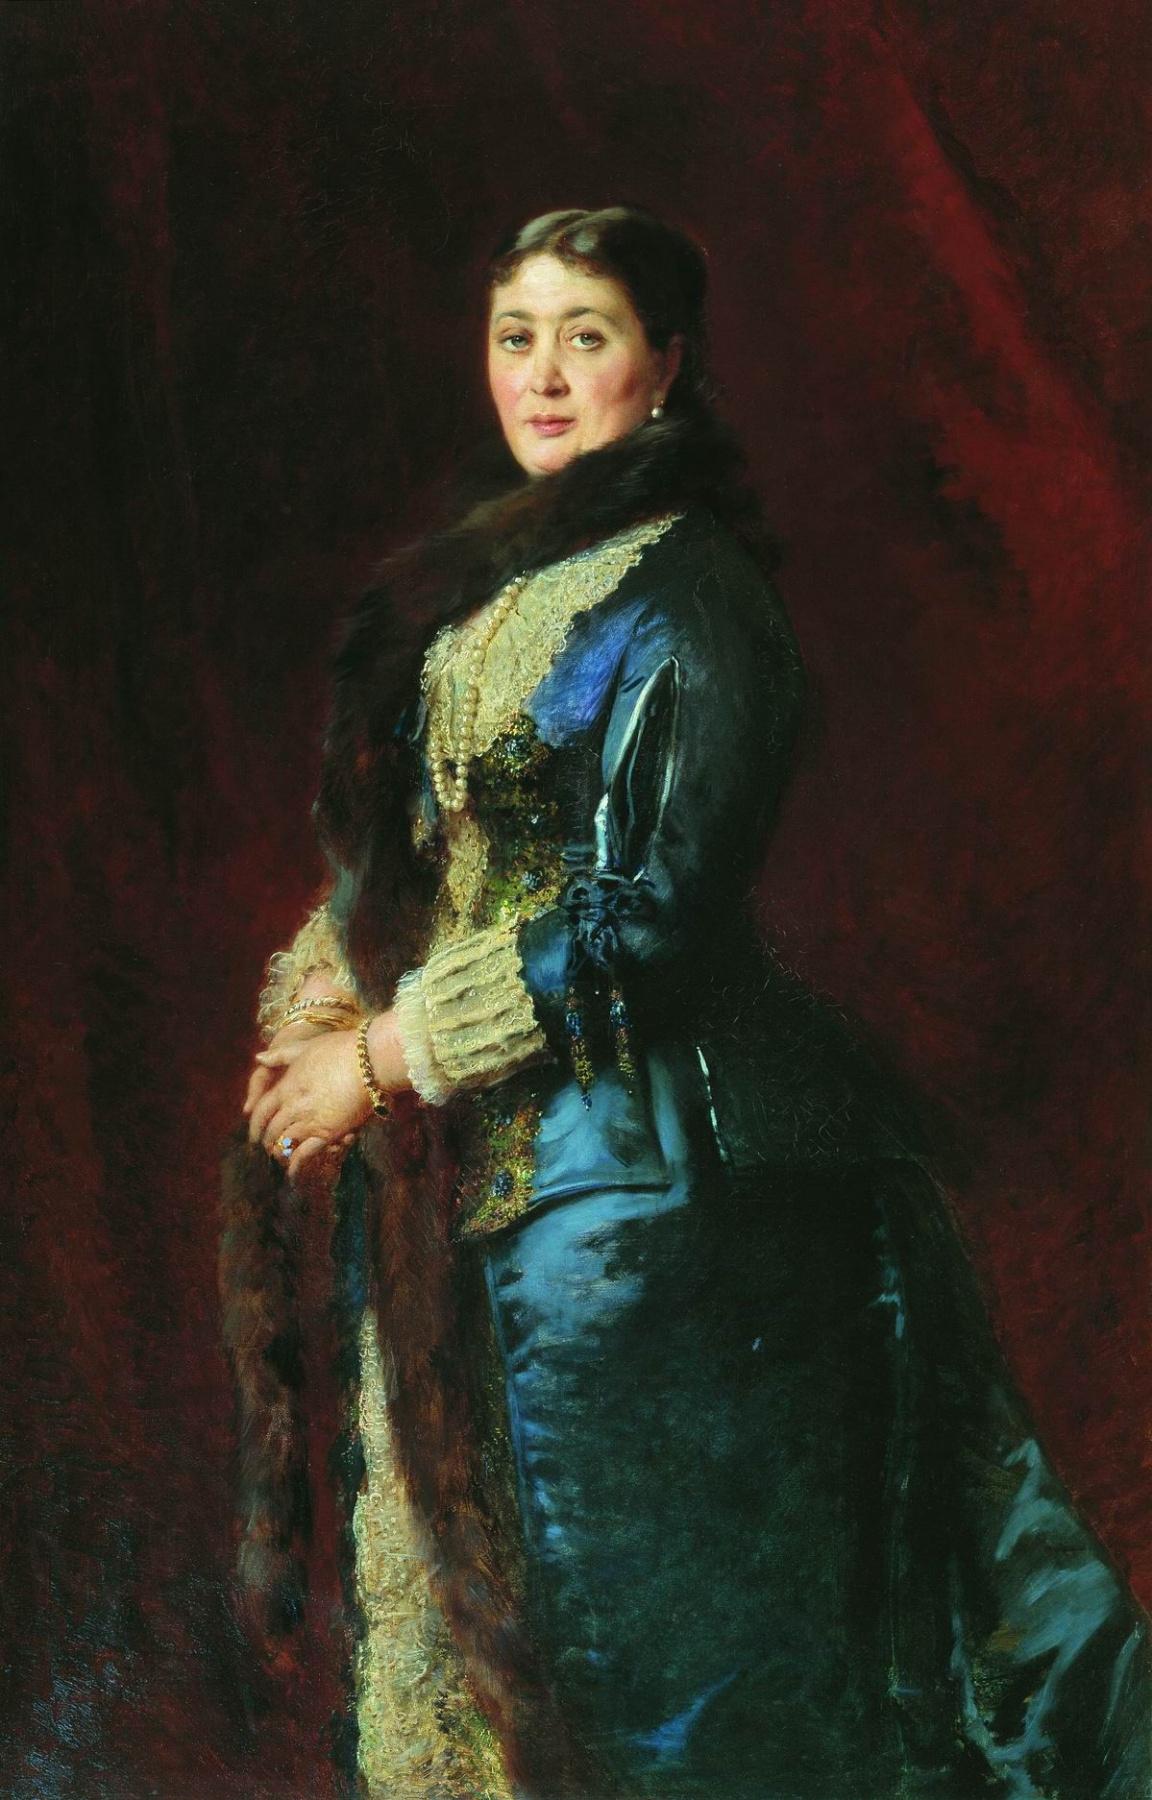 Konstantin Makovsky. Portrait of Countess Maria Yegorovna Orlova-Davydova